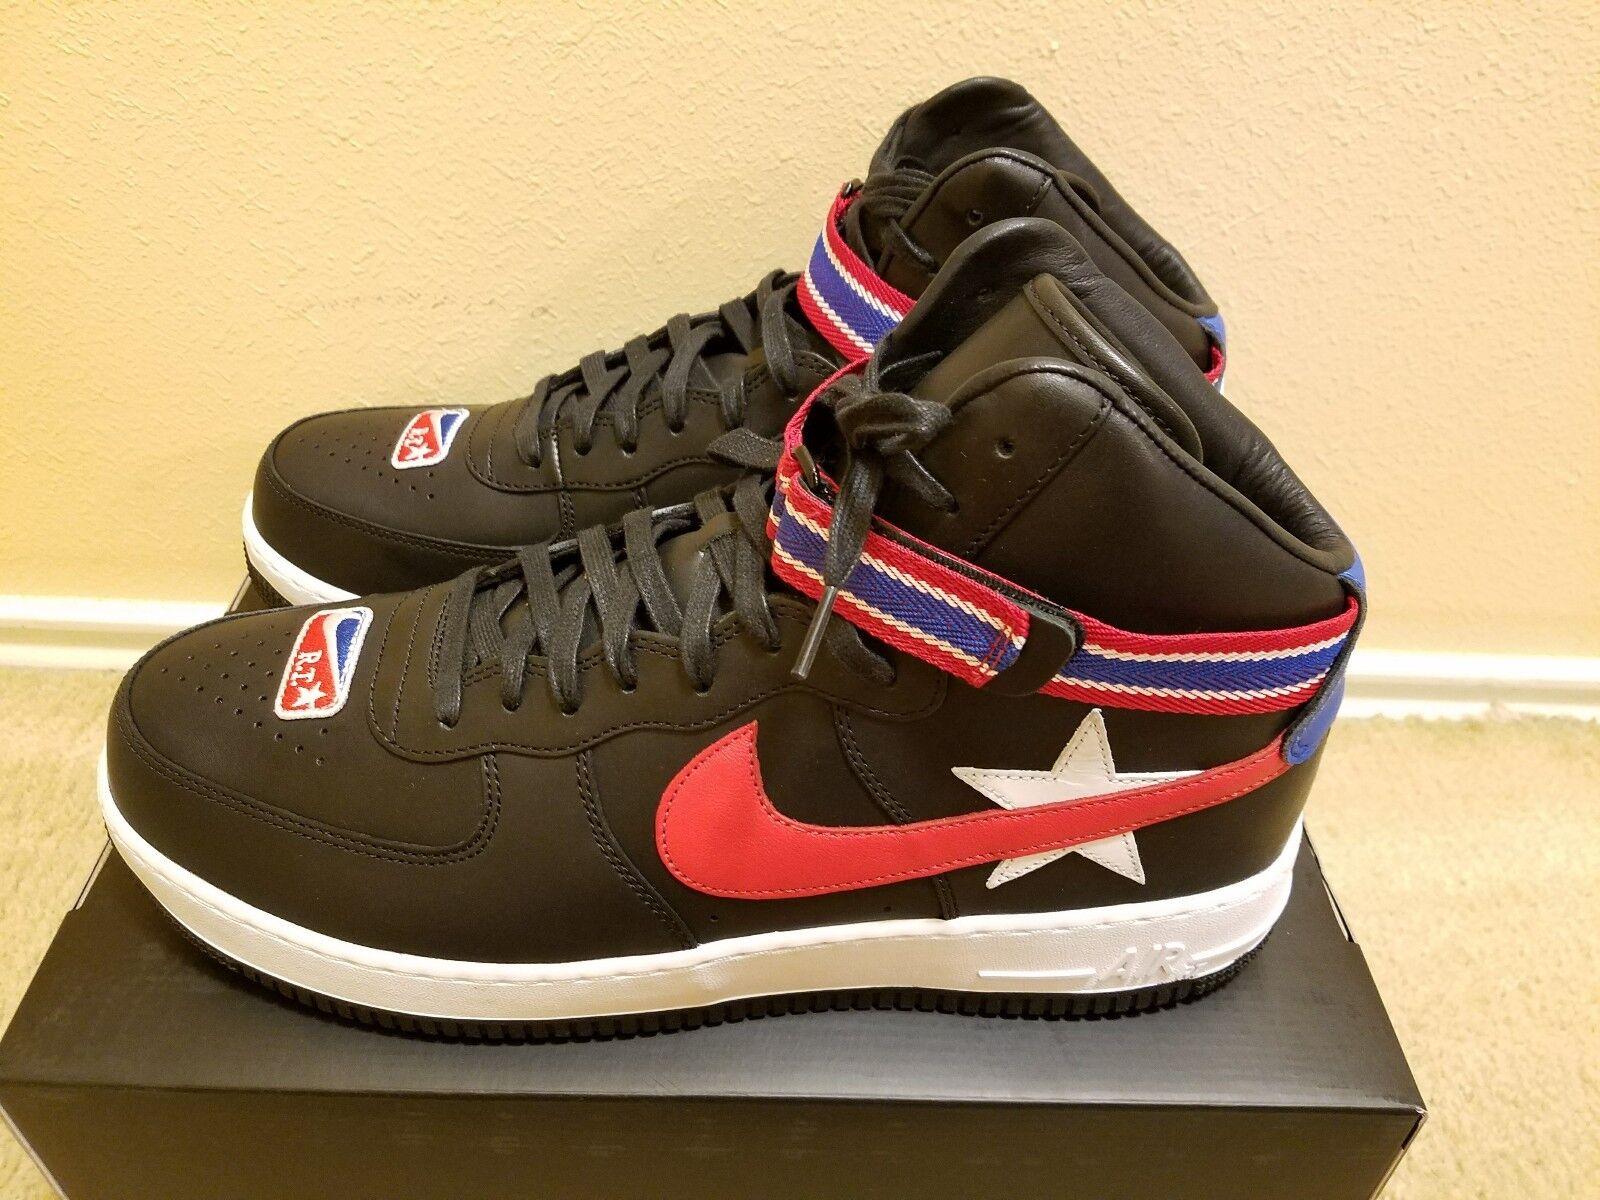 Nike Air Force 1 High x Riccardo Tisci AQ3366 001 sz 14 100% Authentic NEW